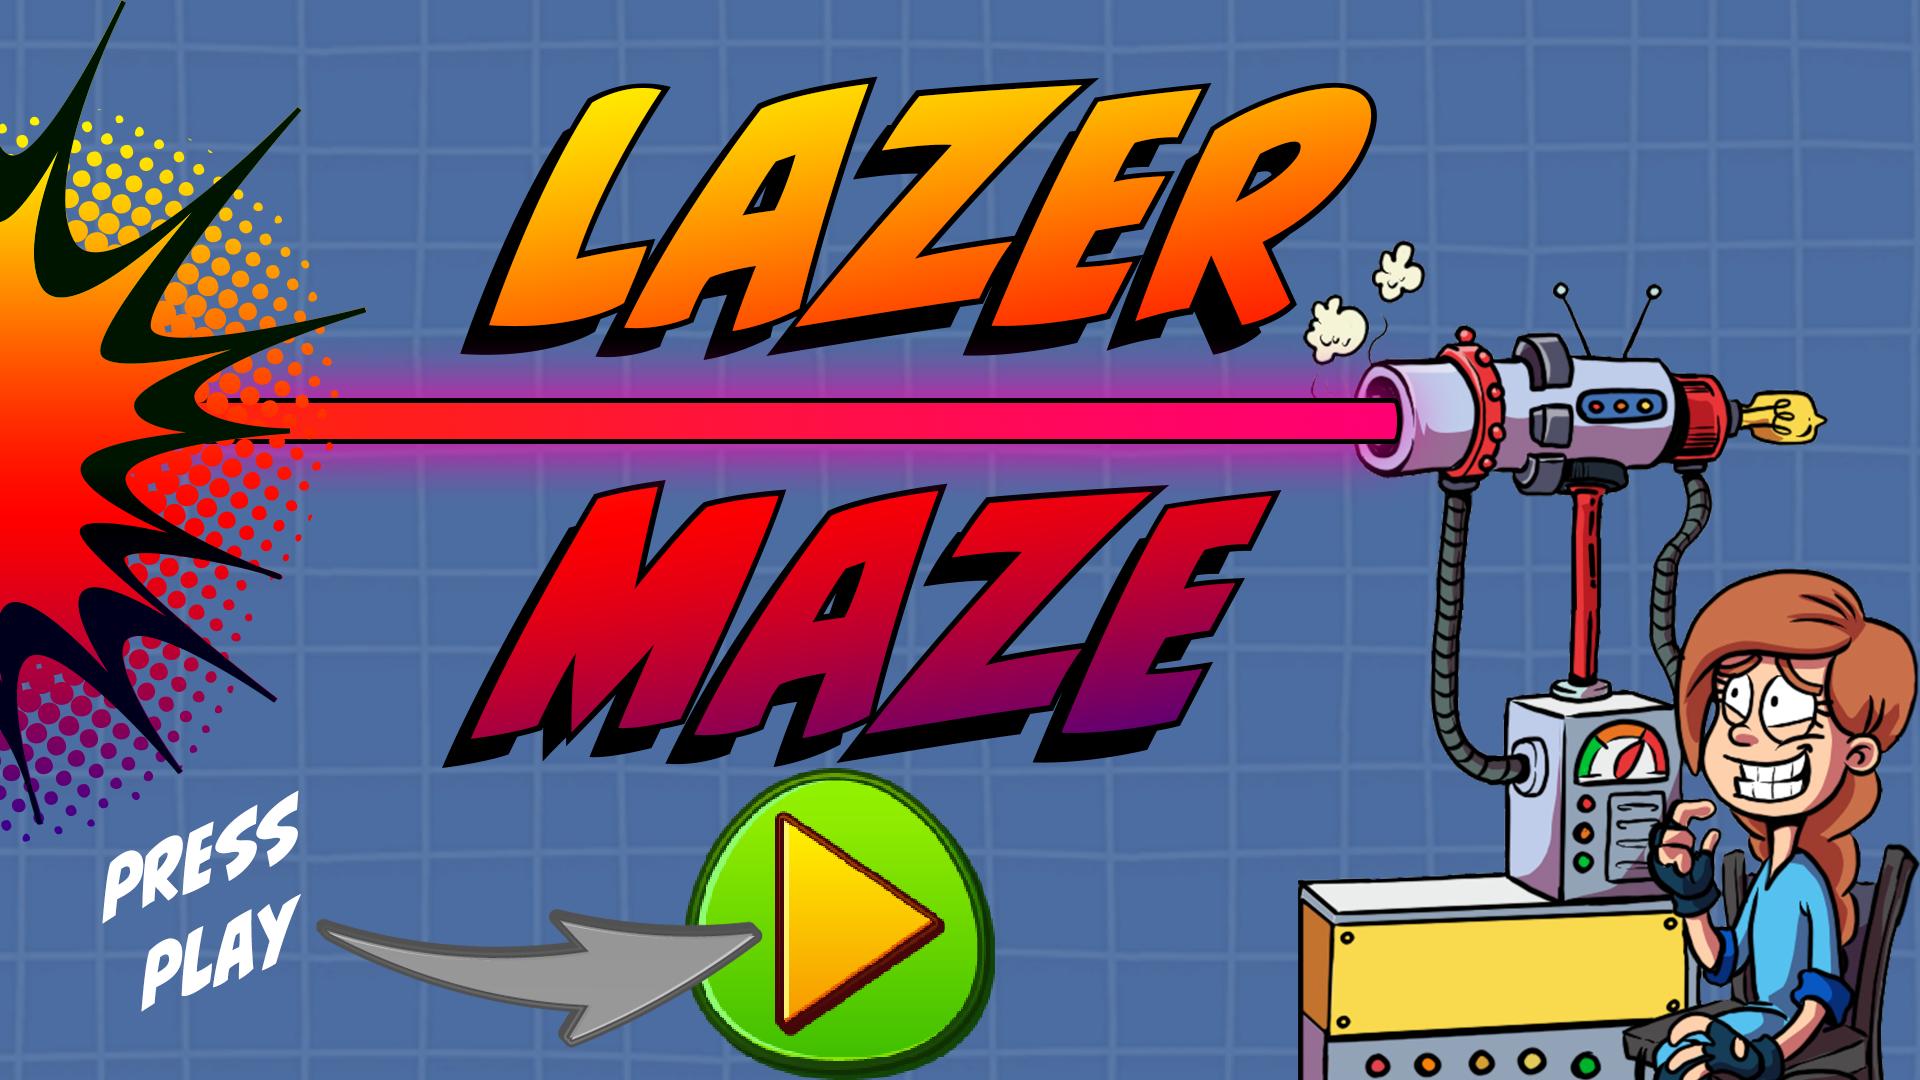 Lazer Puzzle Game: Lazer Maze